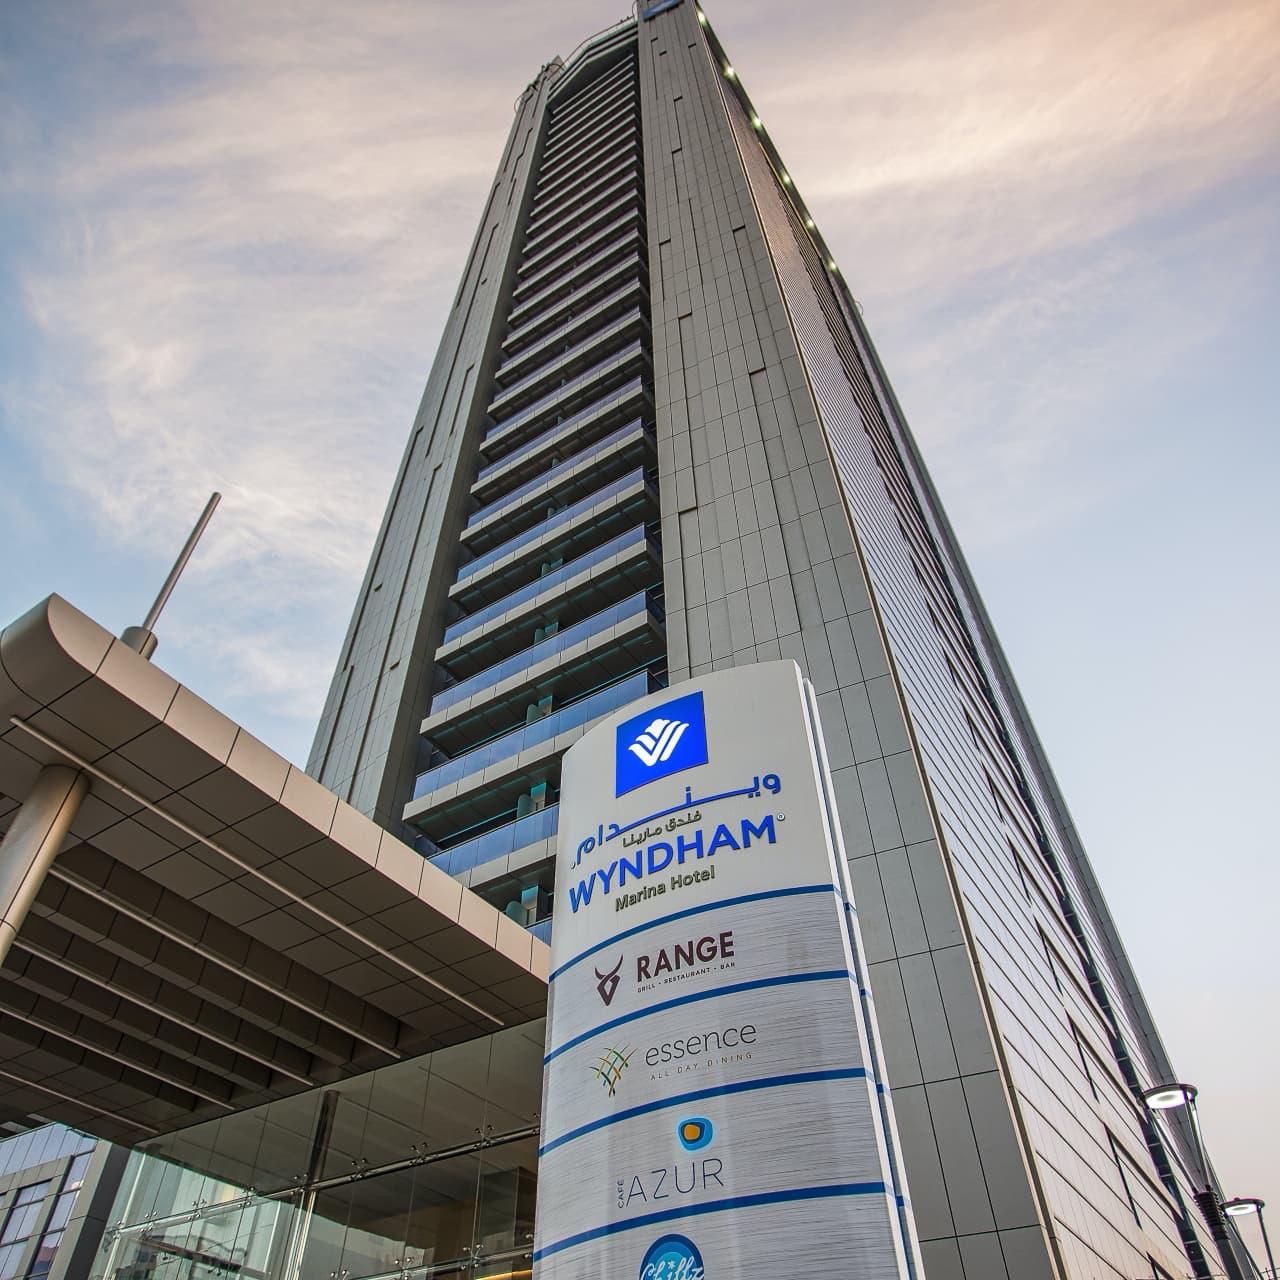 Wyndham_Dubai_Marina-Dubai-Hotel_outdoor_area